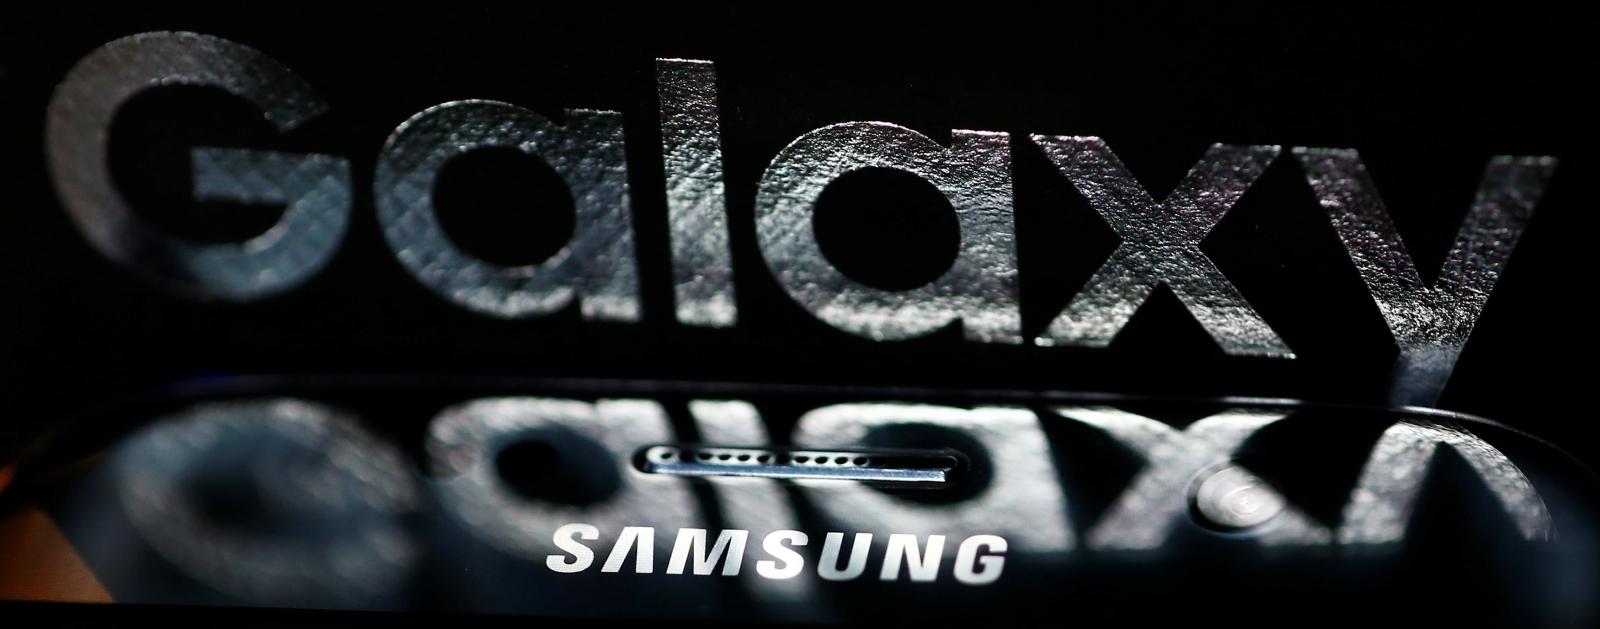 Samsung Galaxy S8+ large screen model